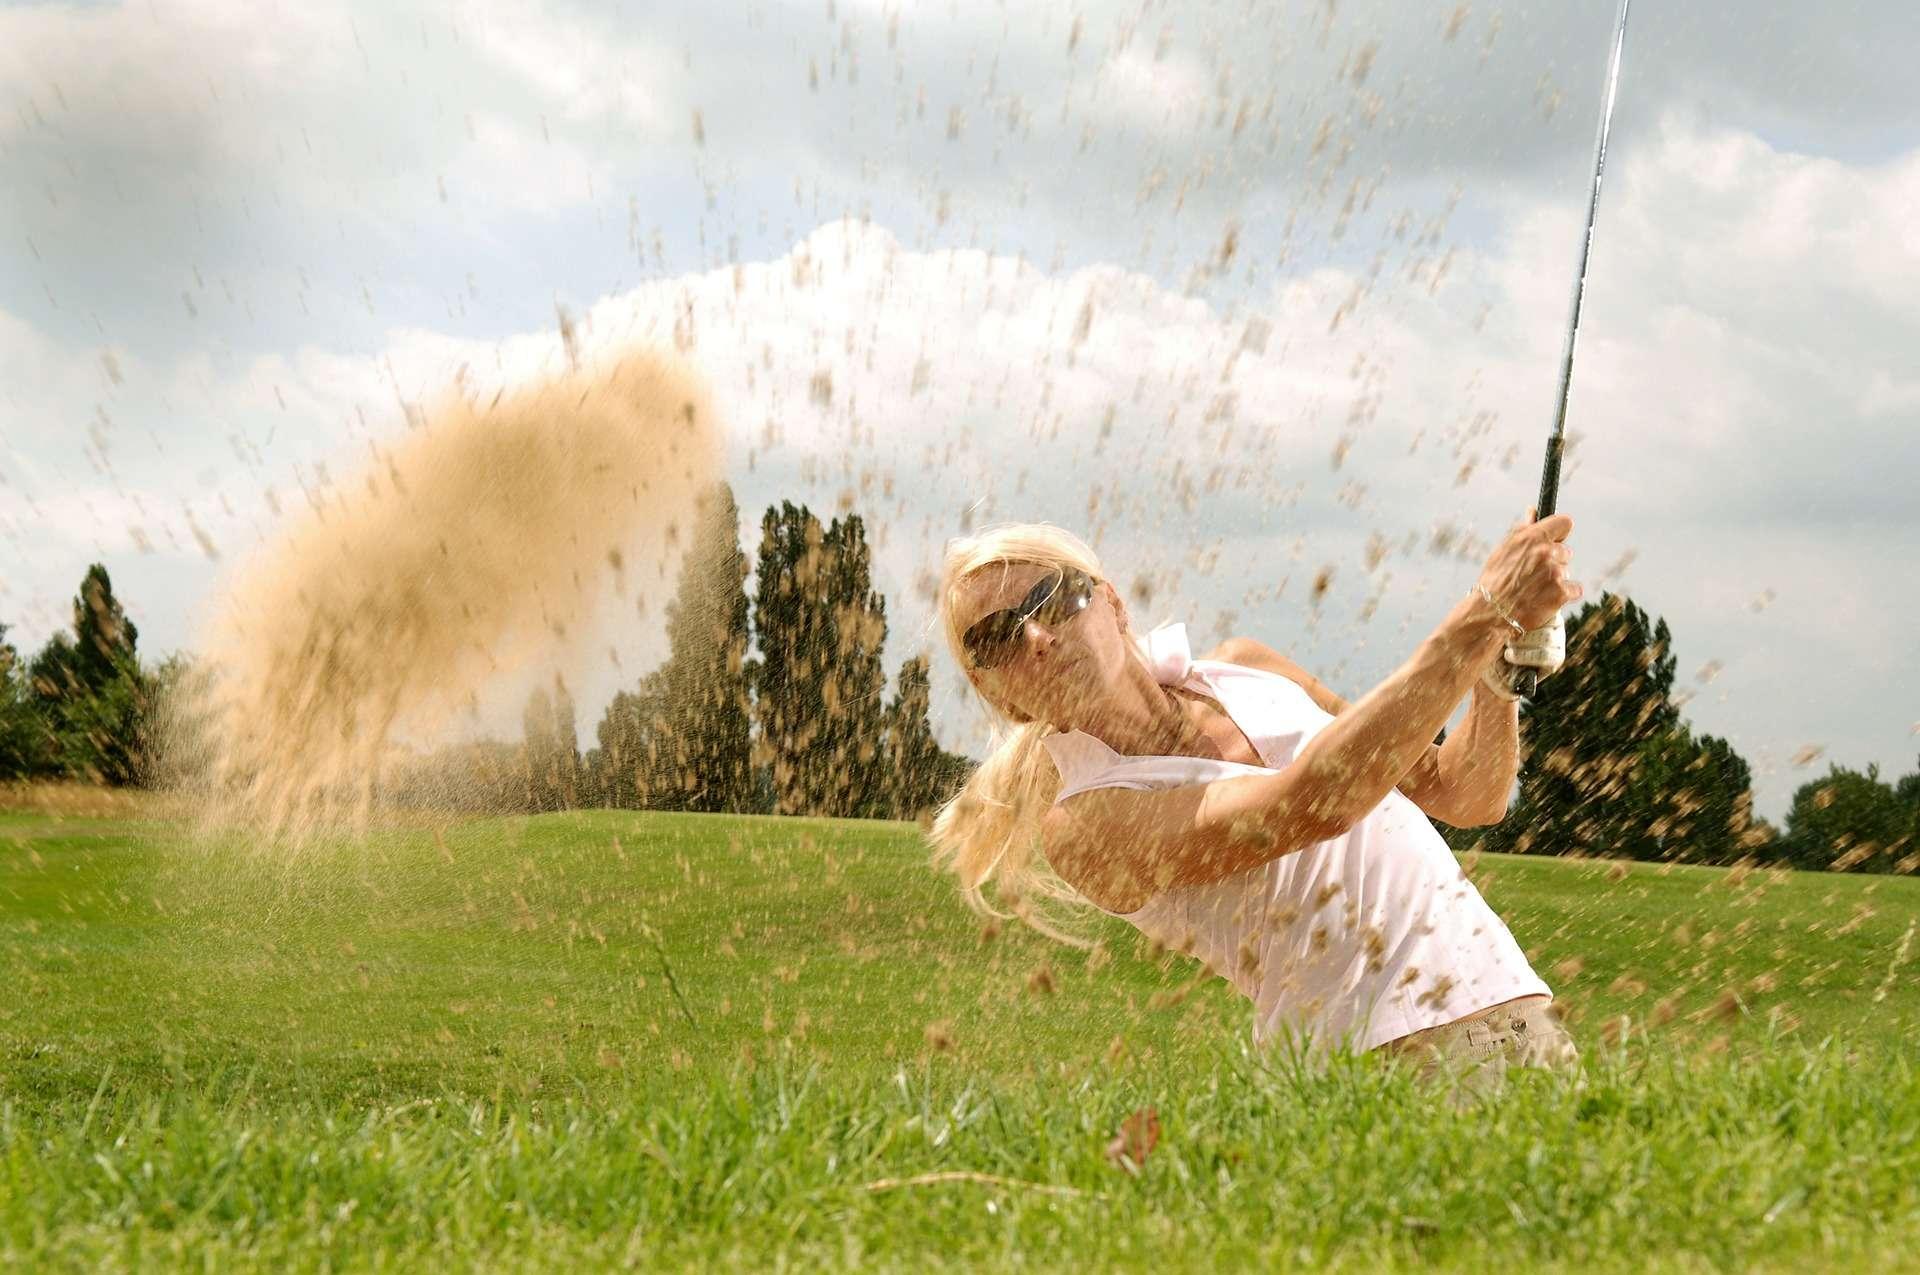 woman golfing